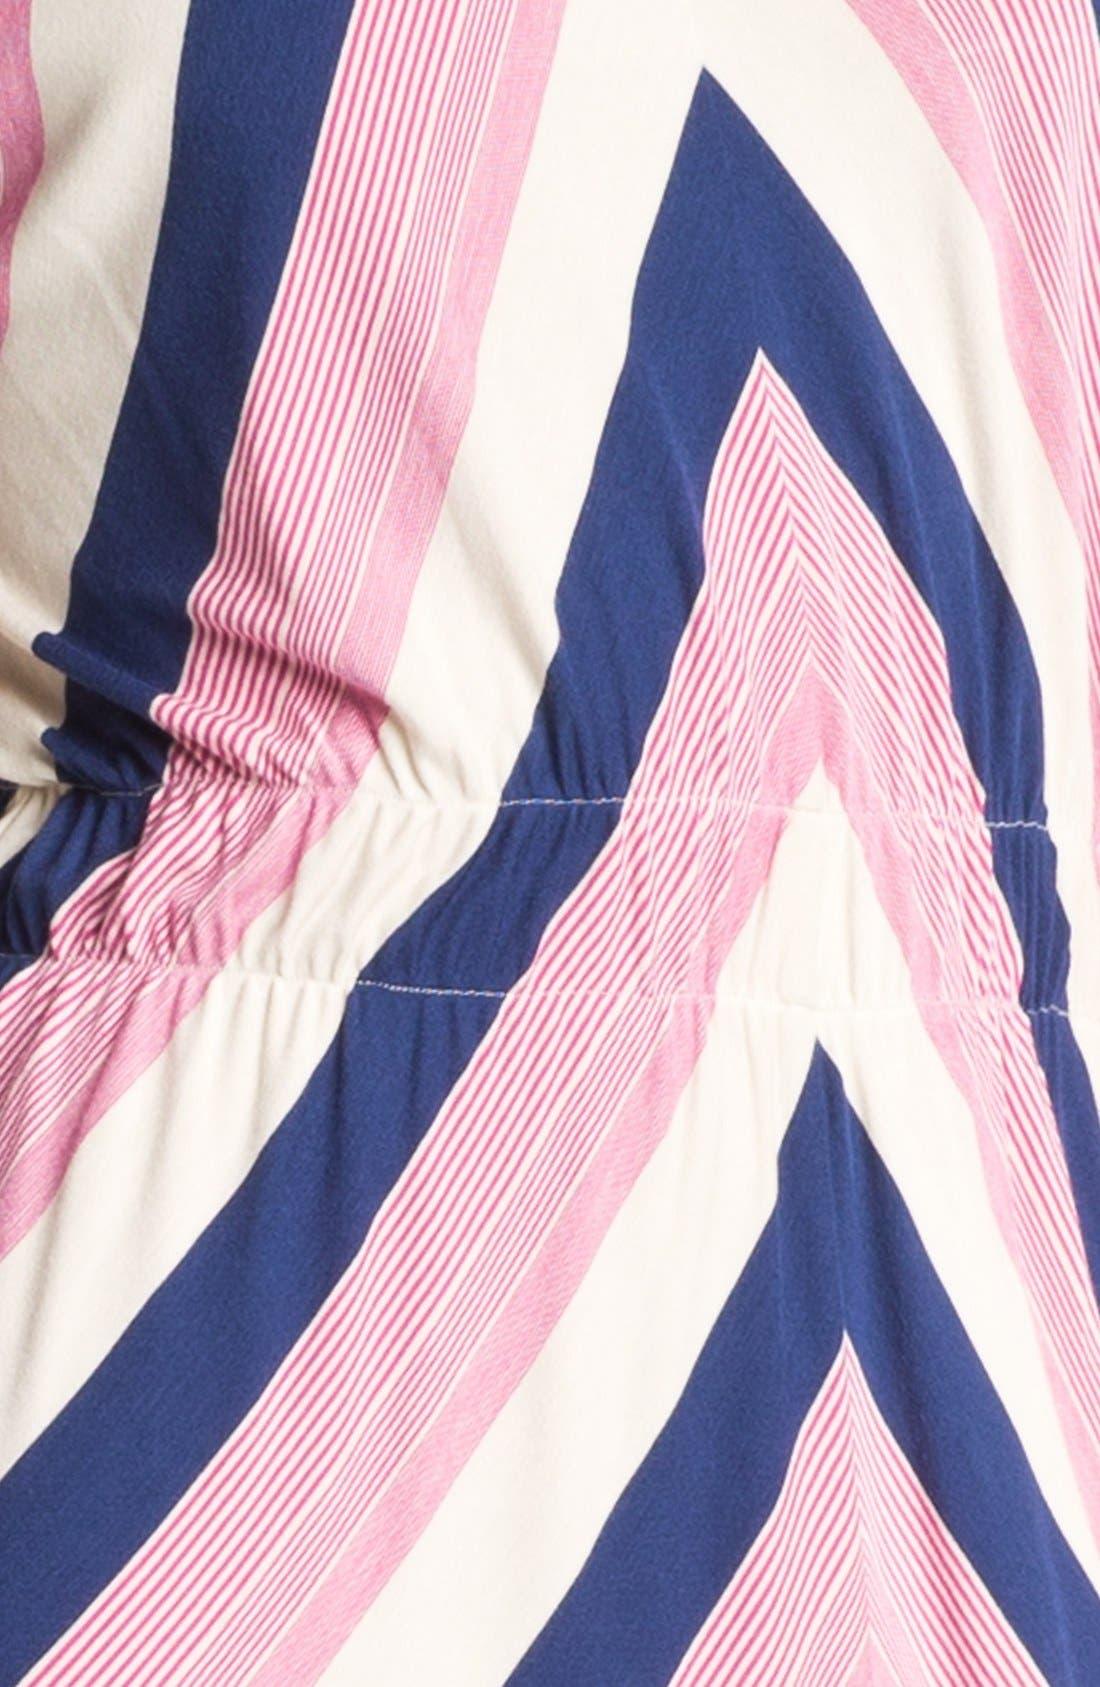 FELICITY & COCO, Stripe High/Low Midi Dress, Alternate thumbnail 2, color, 650